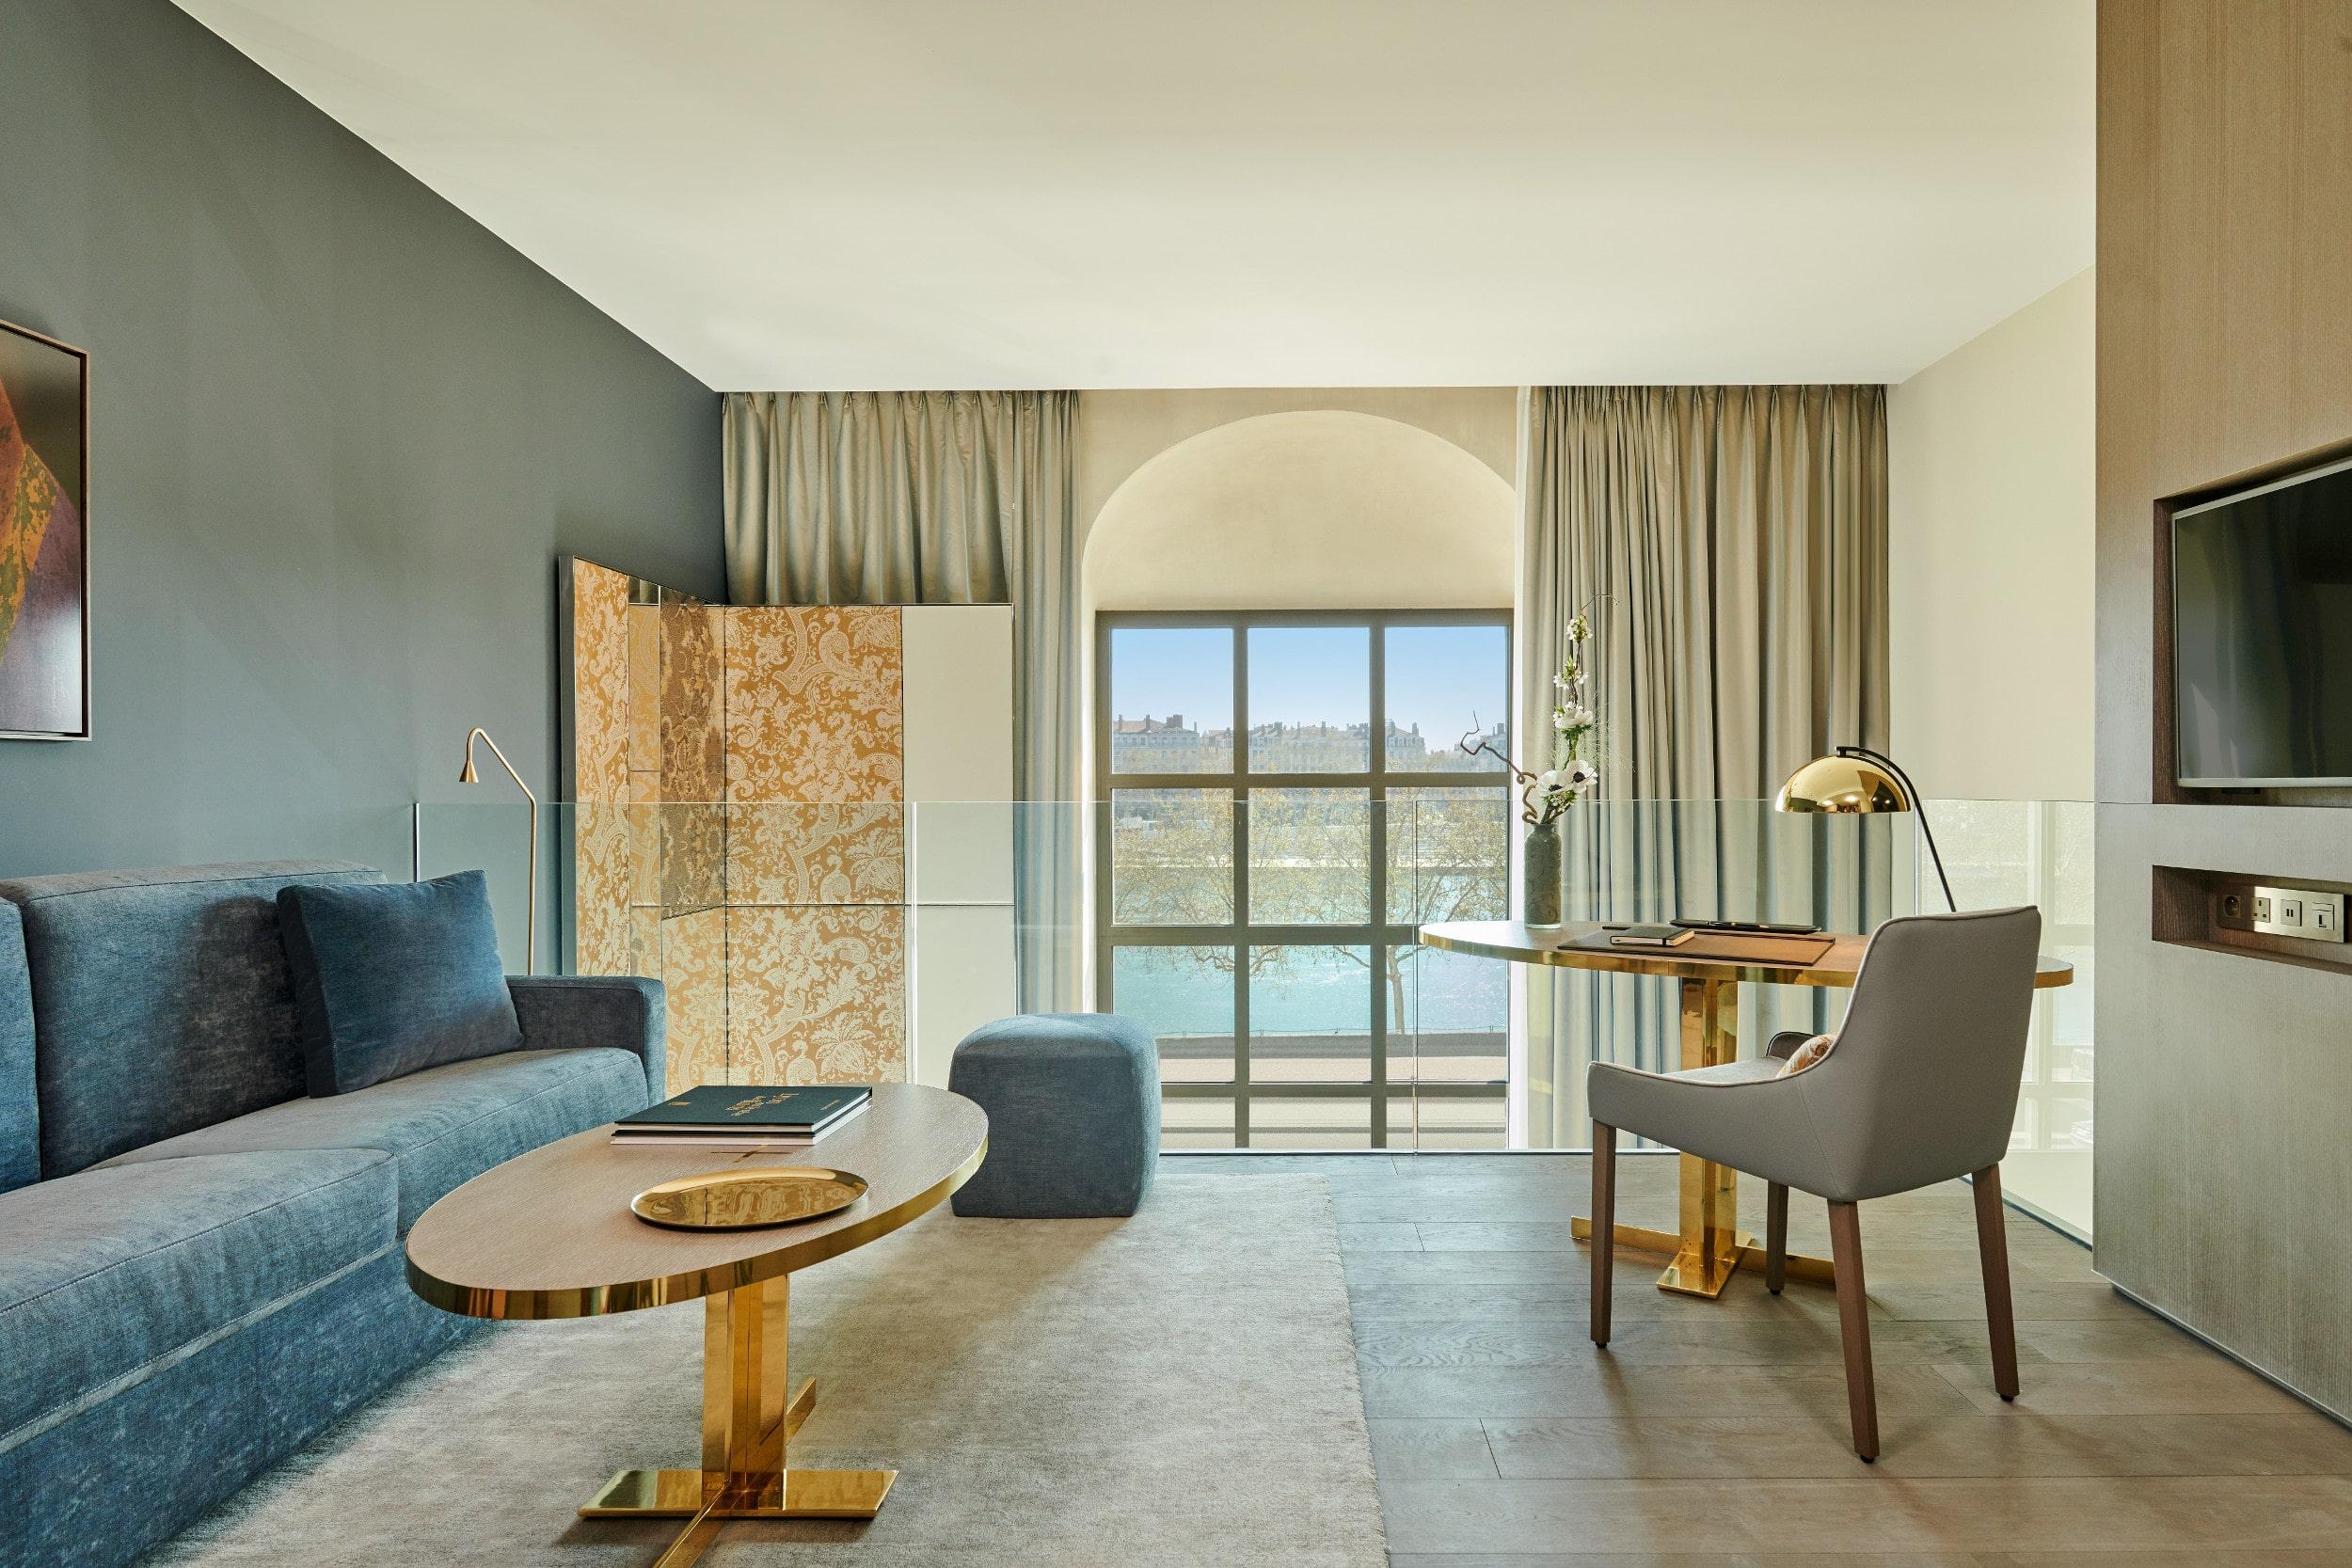 InterContinental Lyon - Hotel Dieu - reservation Suite Duplex